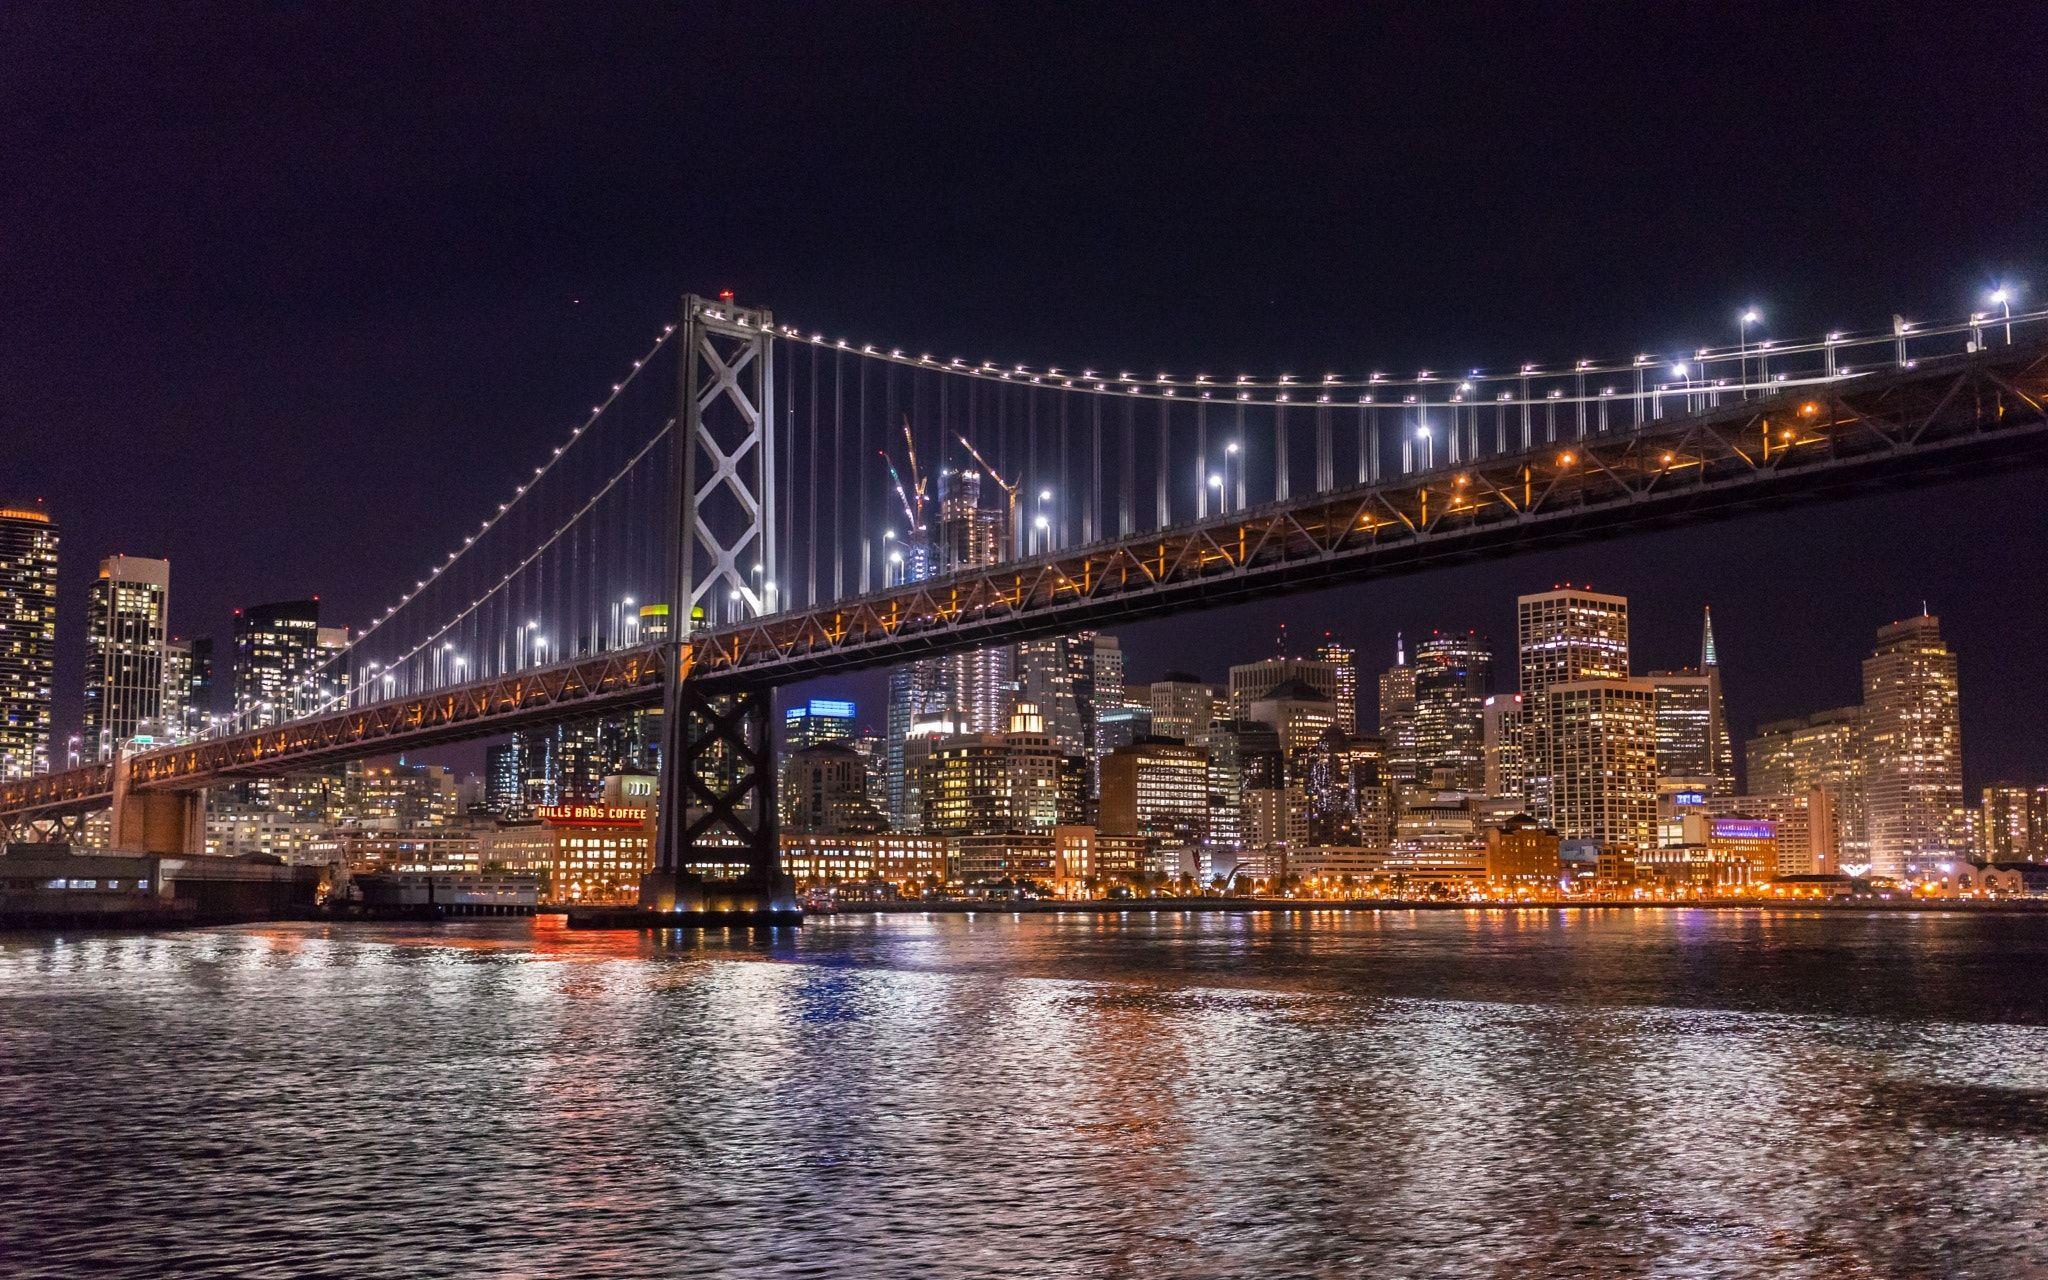 San Francisco Night Cruise View Of The San Francisco Oakland Bay Bridge And The Bright Illuminated City Of San Franc San Francisco At Night Bay Bridge Cruise